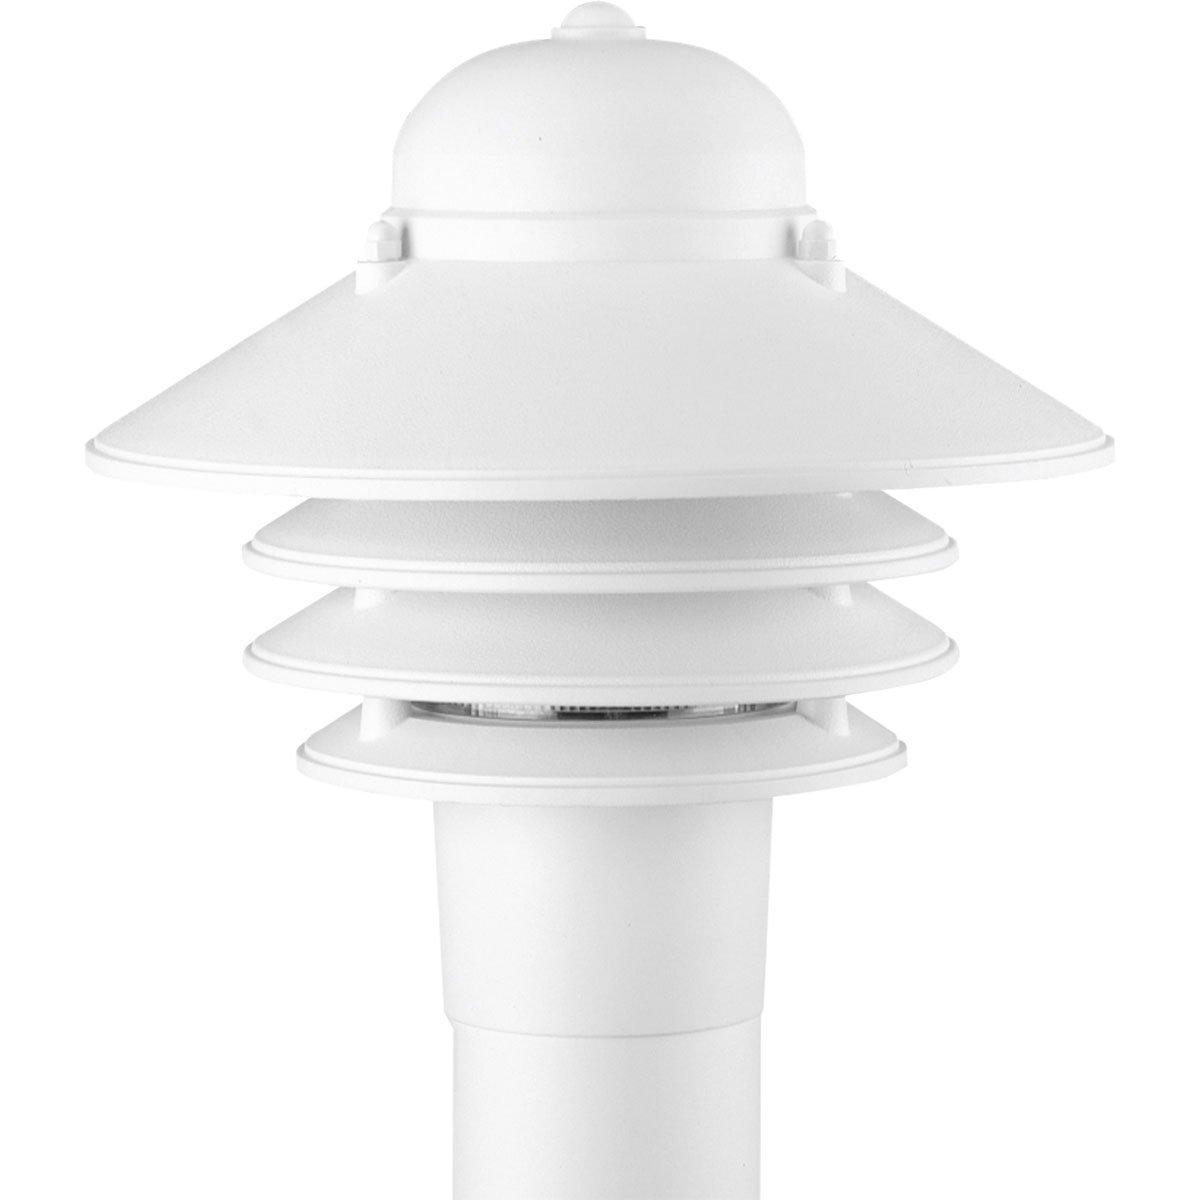 Progress Lighting P5444-30 Single-Light Plastic Post Mounted Fixture, White by Progress Lighting